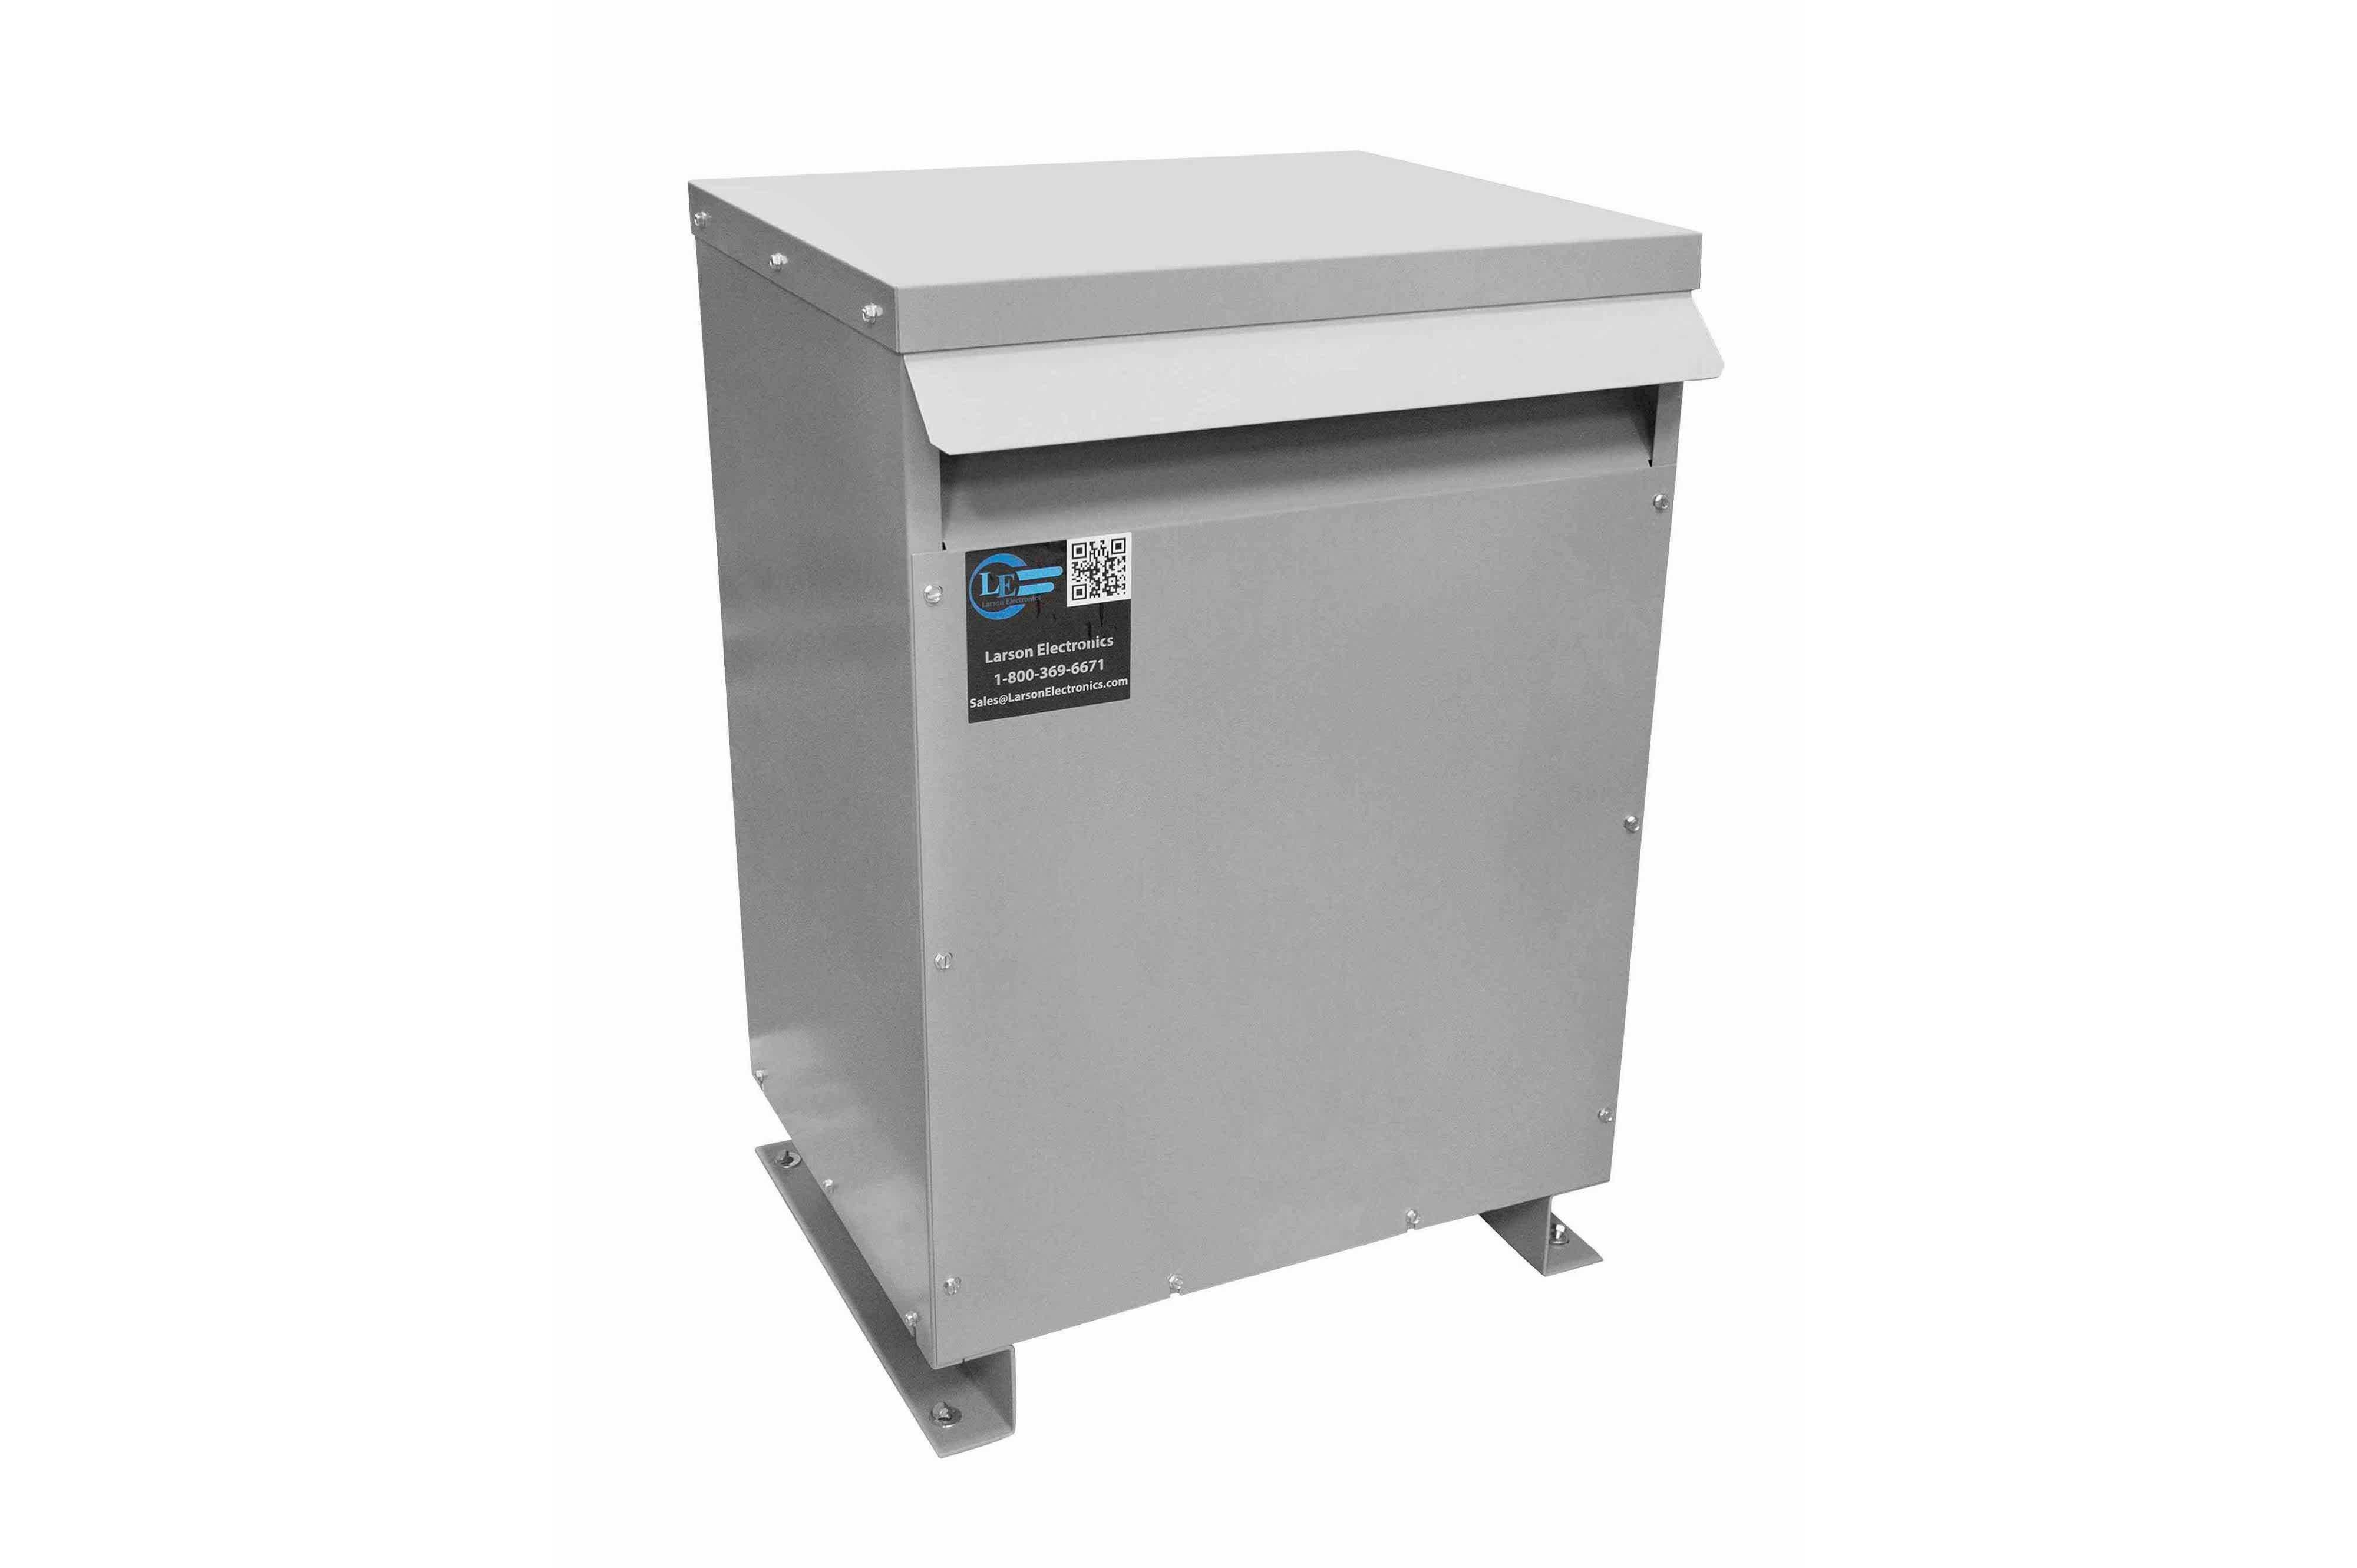 28 kVA 3PH Isolation Transformer, 380V Wye Primary, 240V/120 Delta Secondary, N3R, Ventilated, 60 Hz